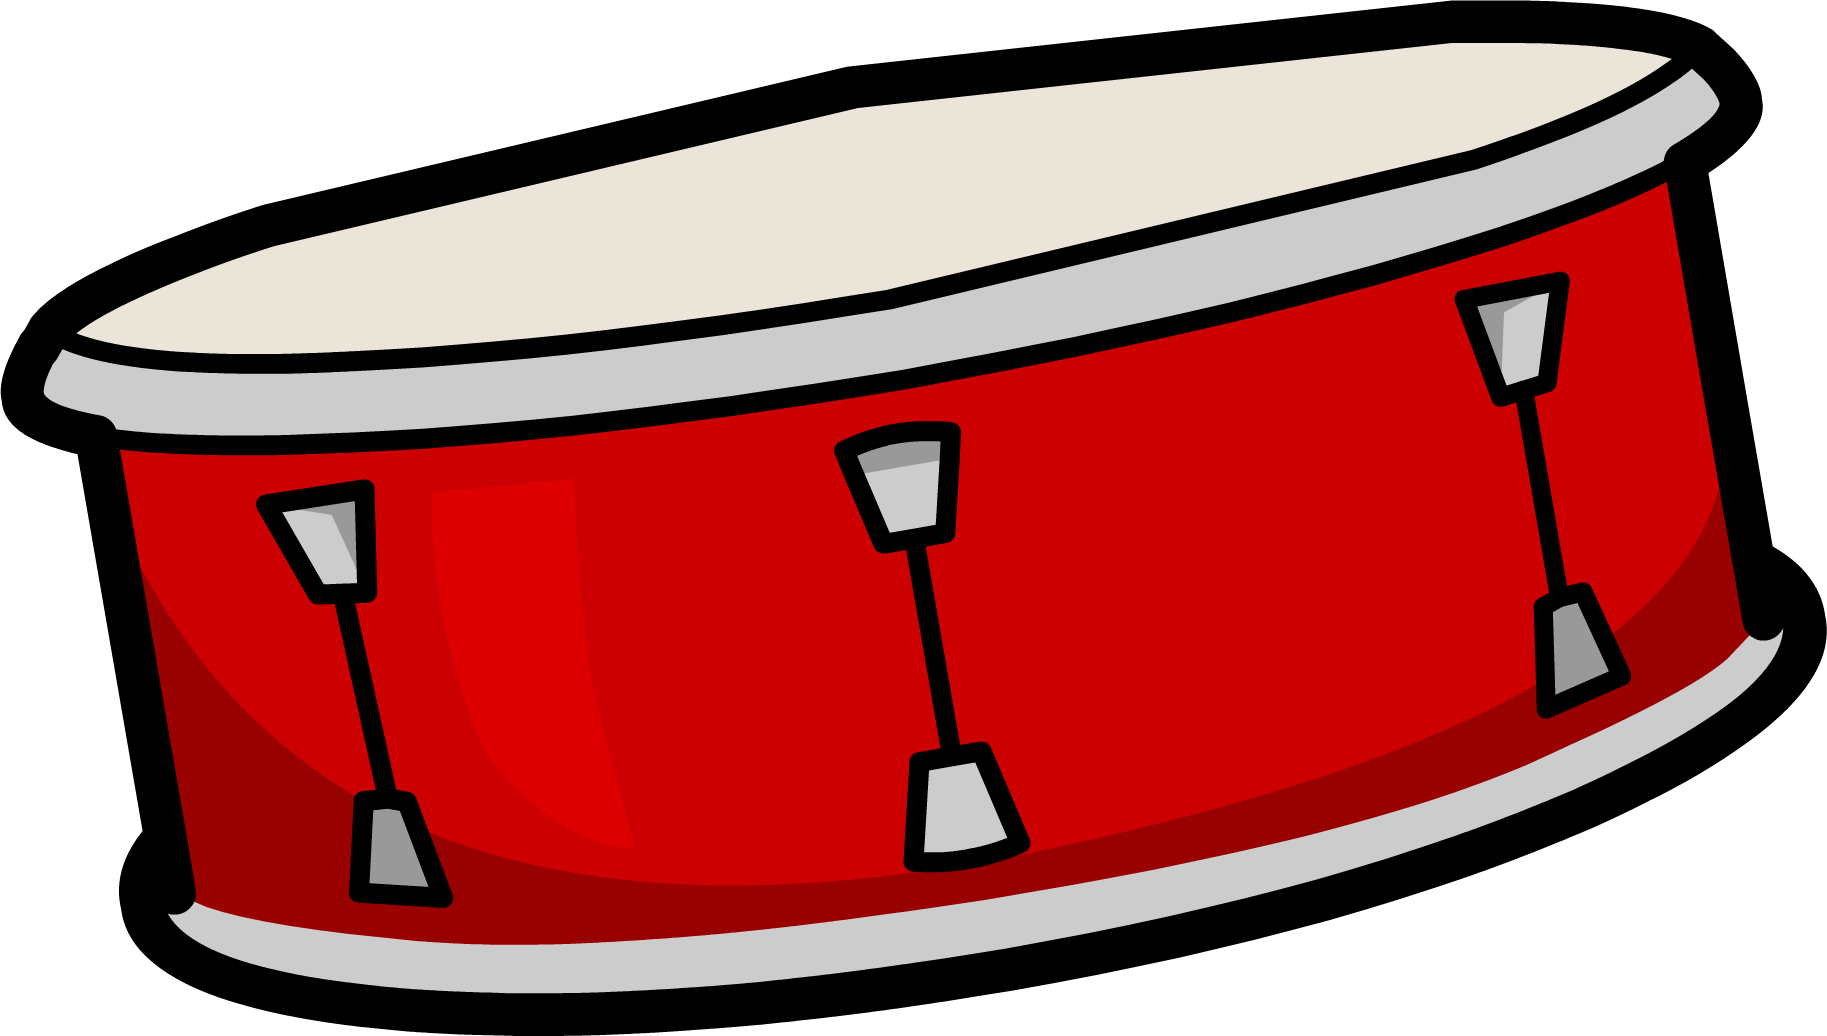 Snare club penguin wiki. Clipart guitar drum